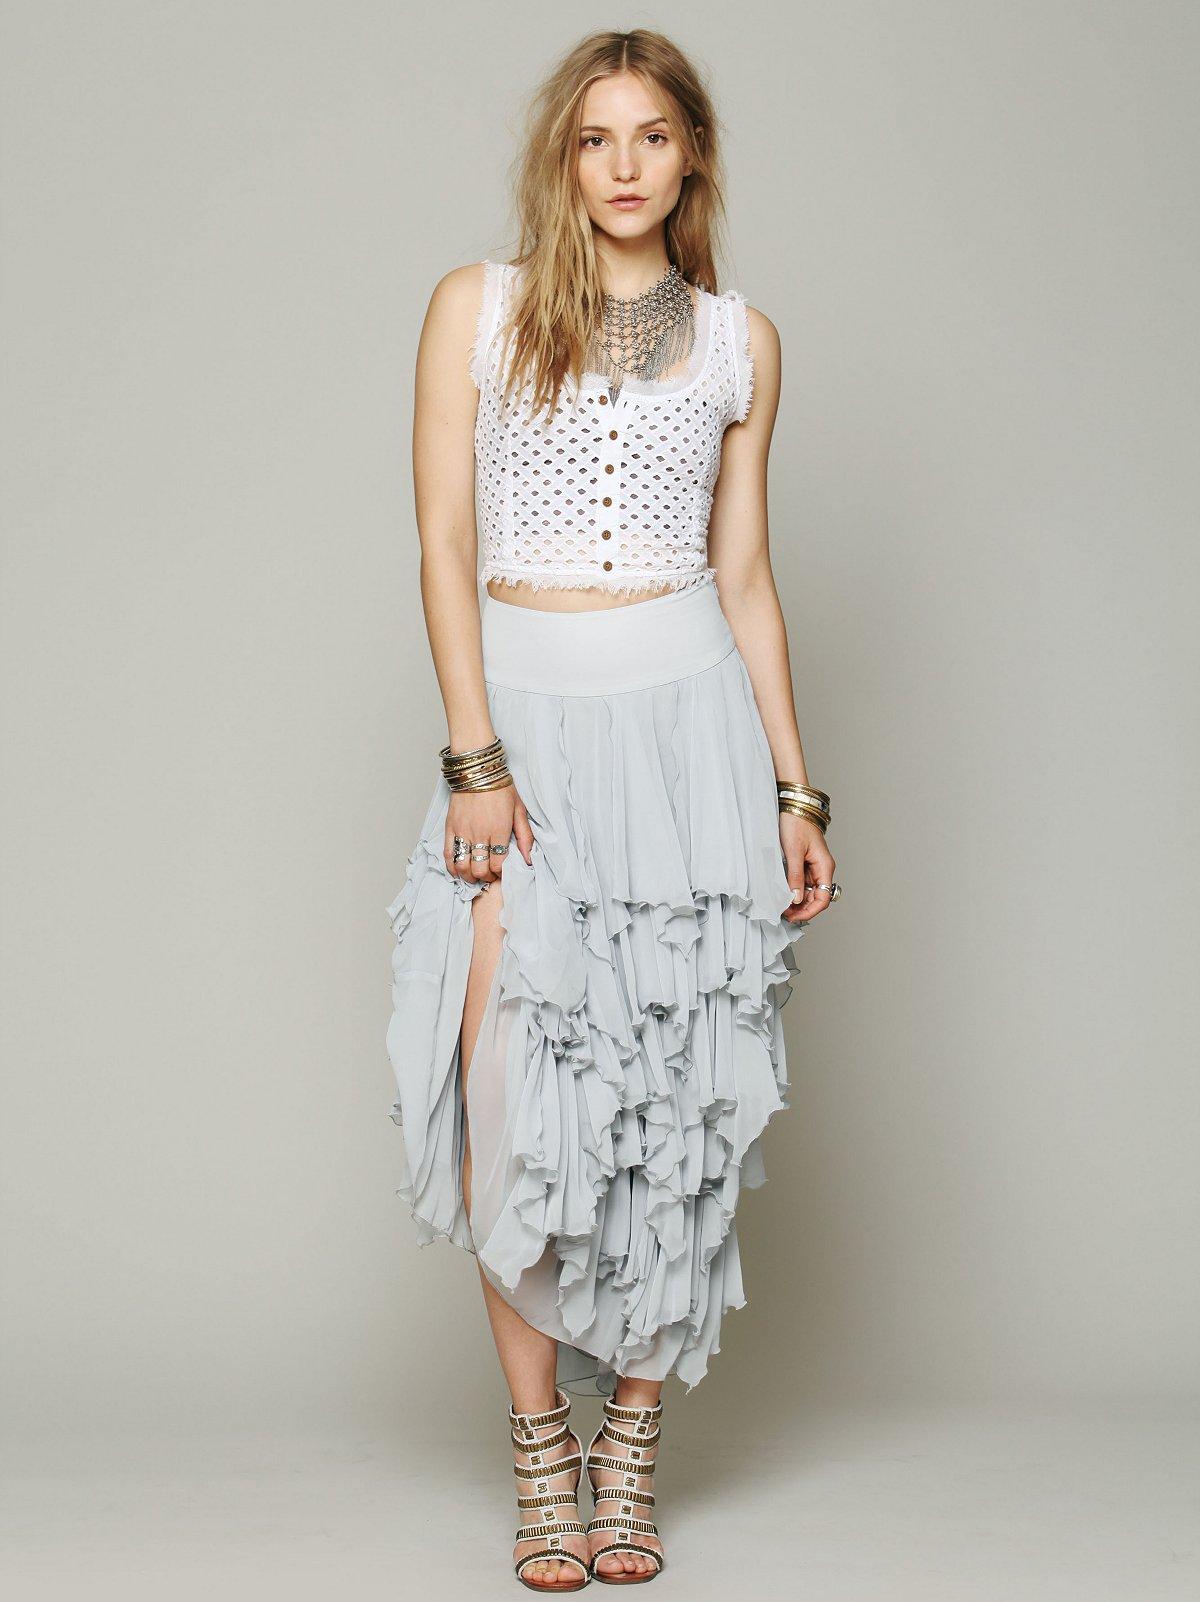 5 Layer Maxi Skirt